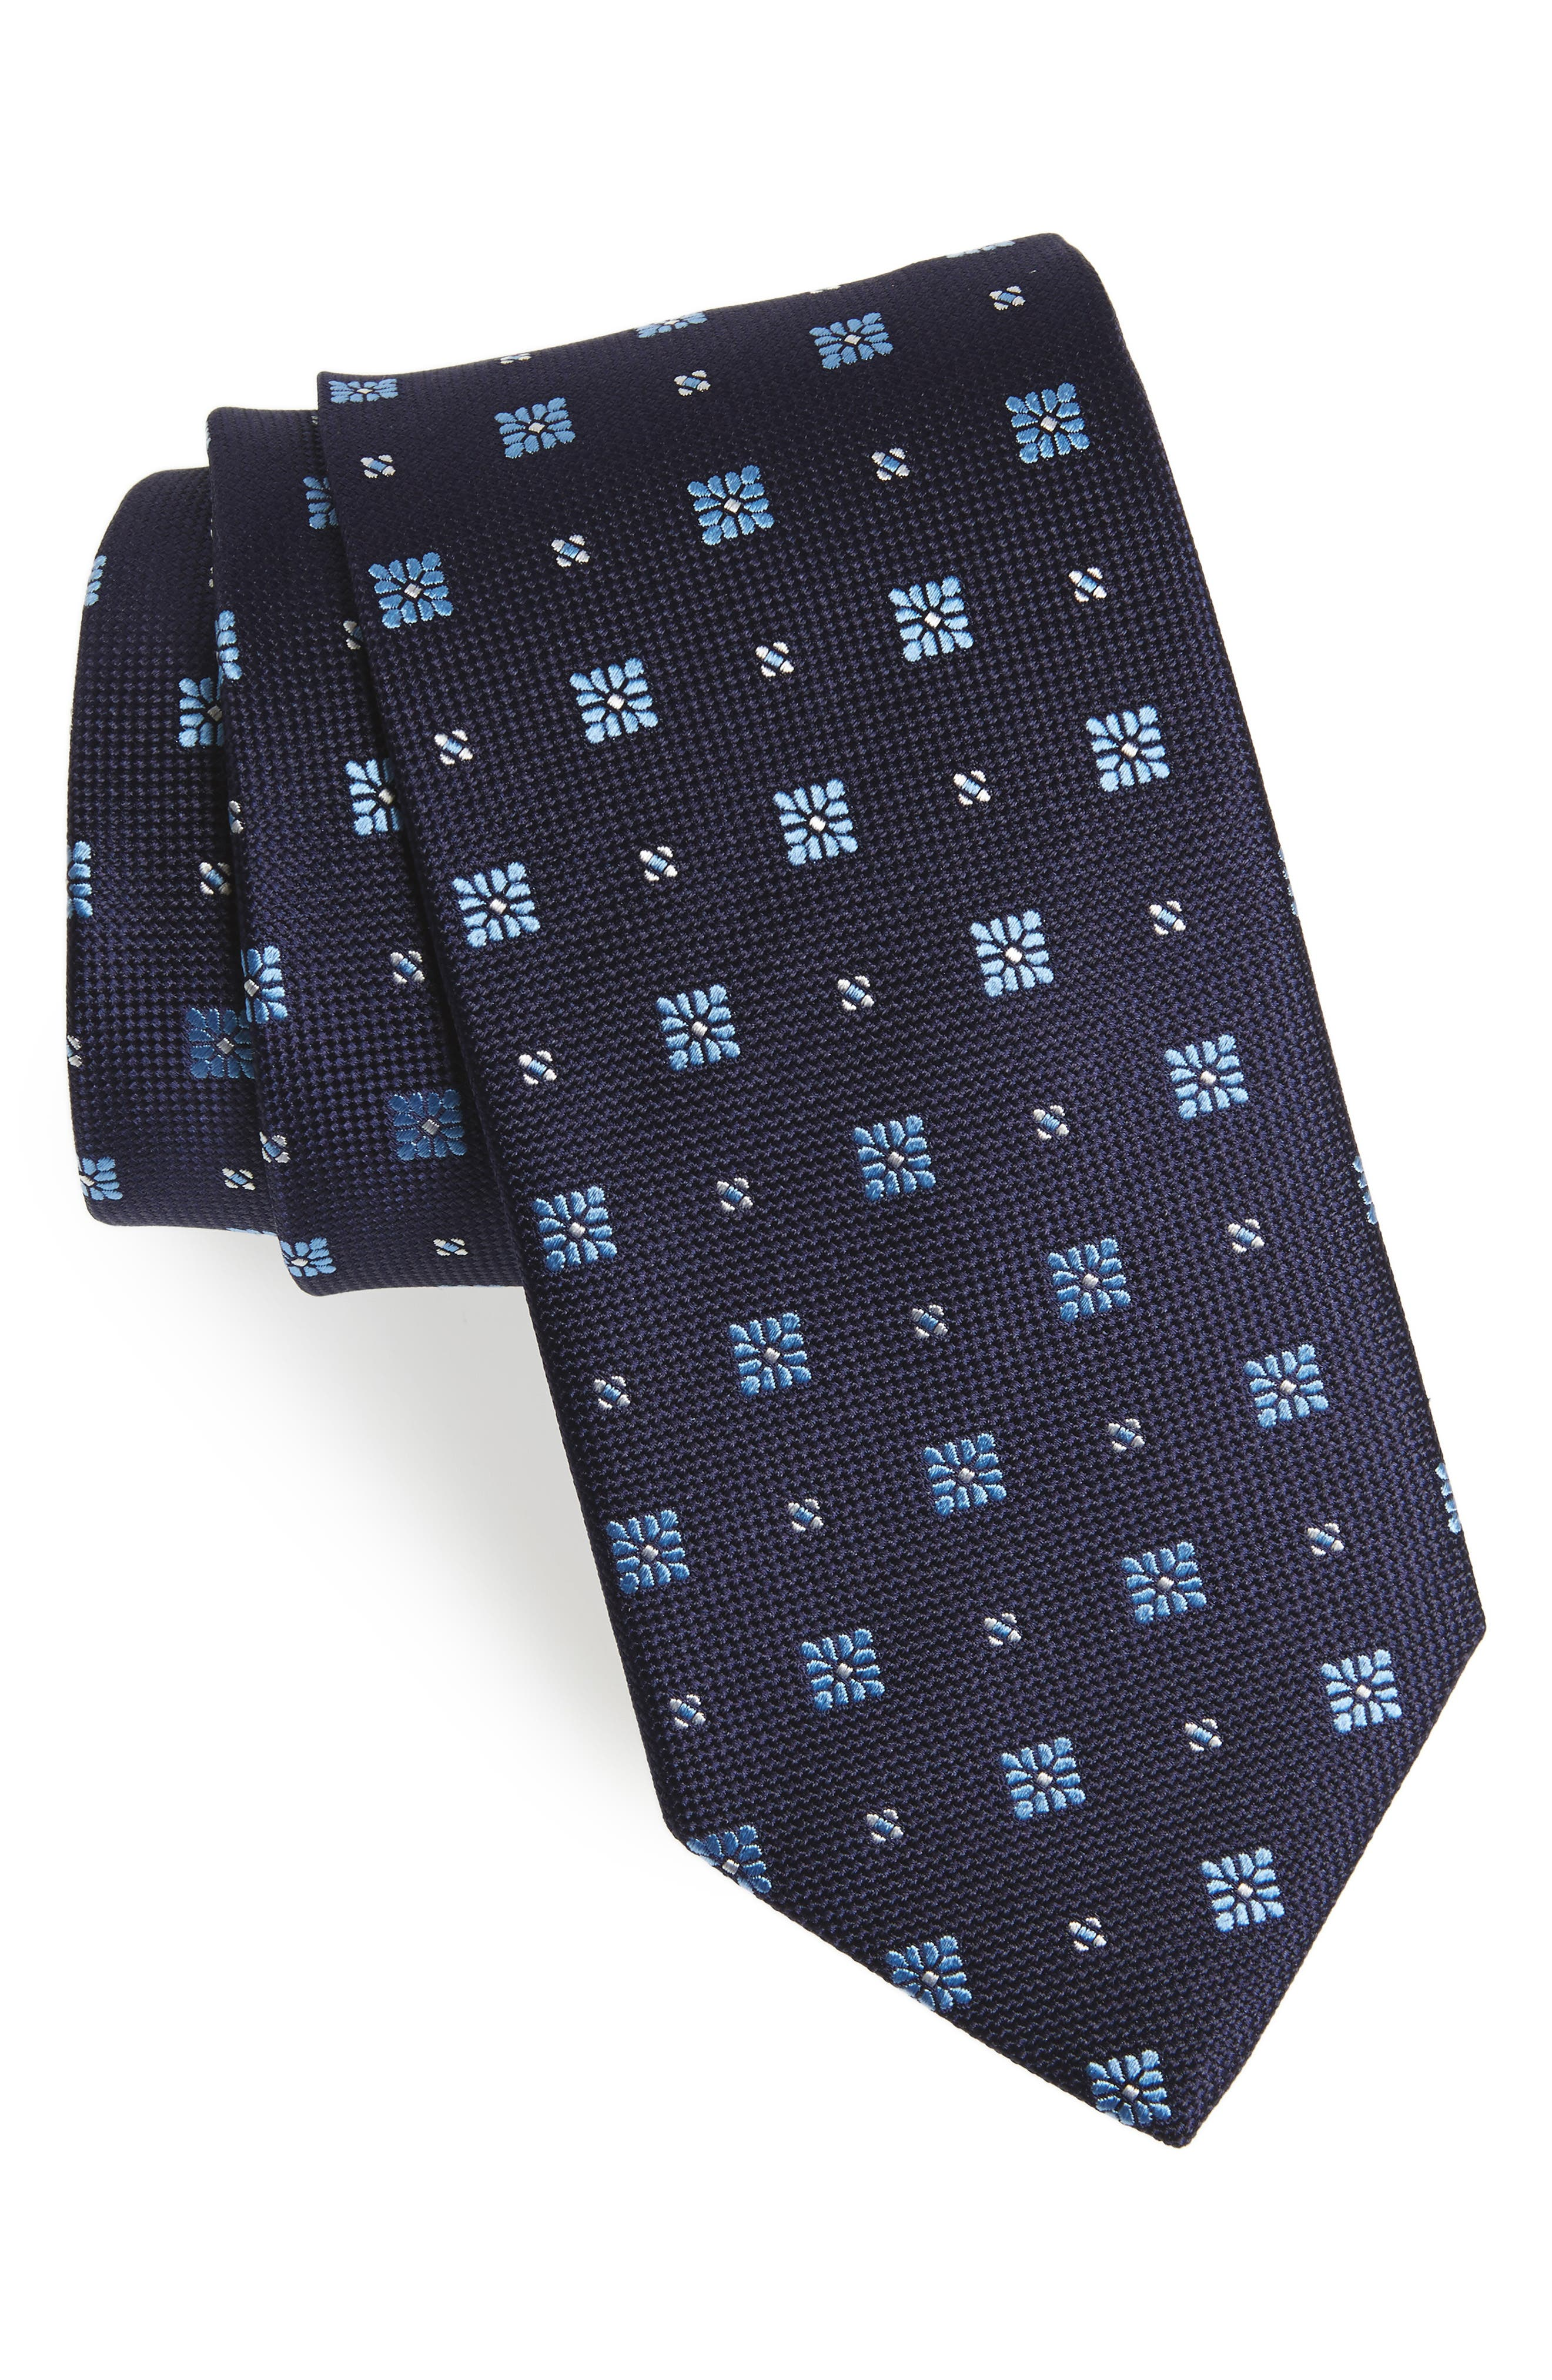 Main Image - Eton Medallion Silk Tie